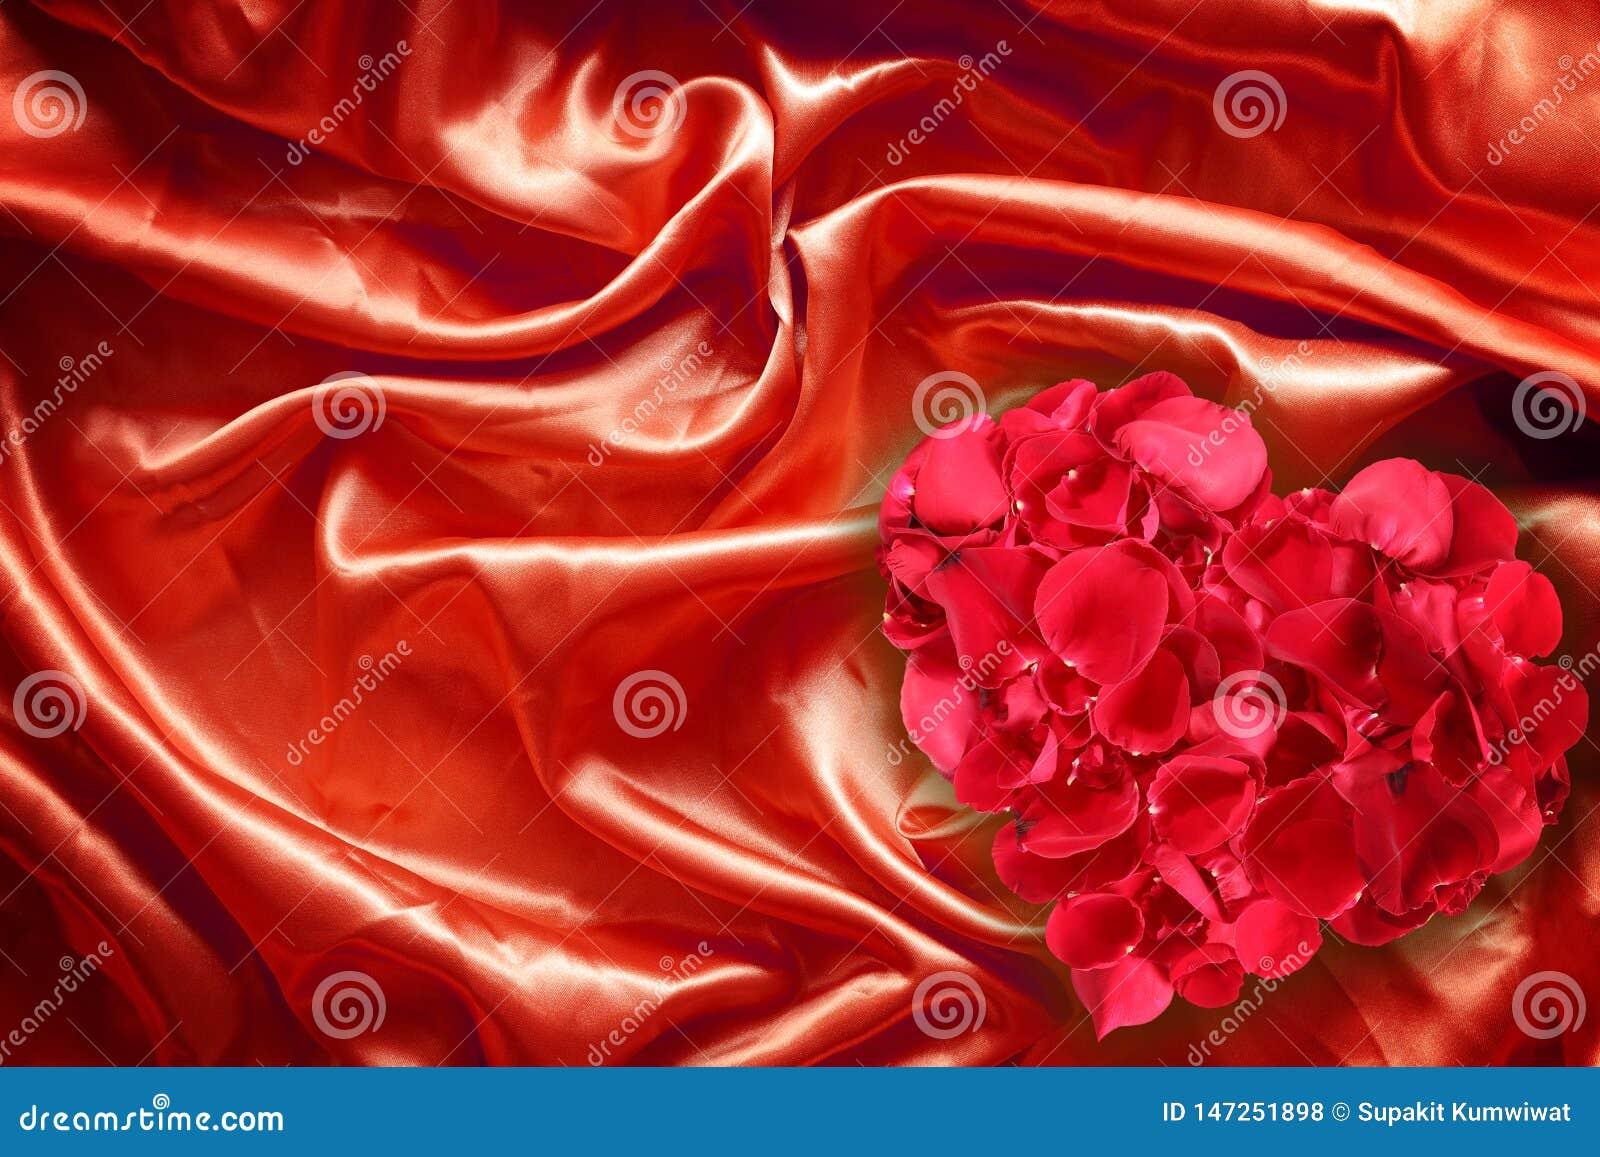 Rose petals on red fabric silk